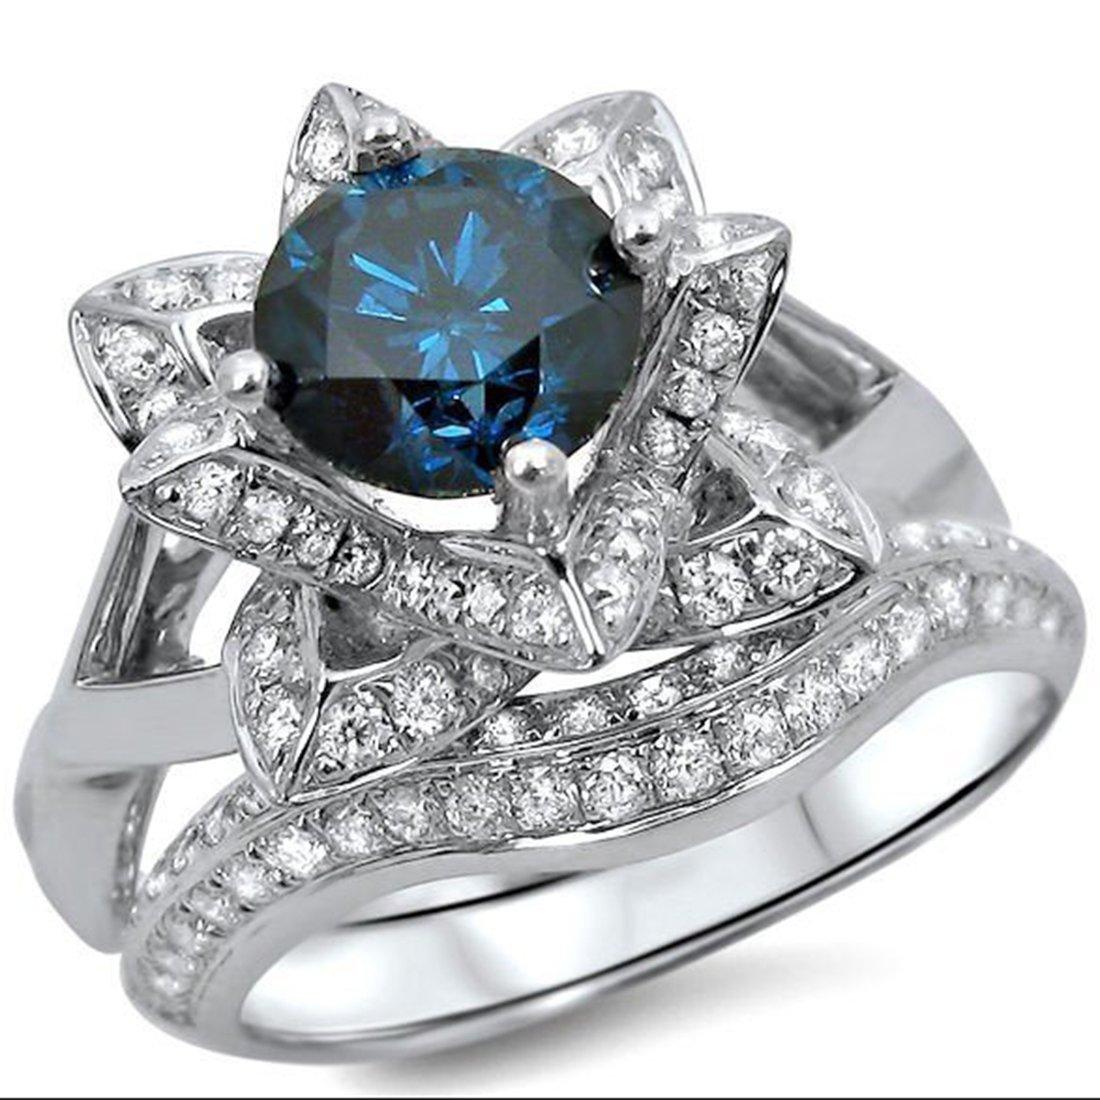 Smjewels 1.70 Ct Blue Round Sim.Diamond Lotus Flower Engagement Ring Set 14K White Gold Plated